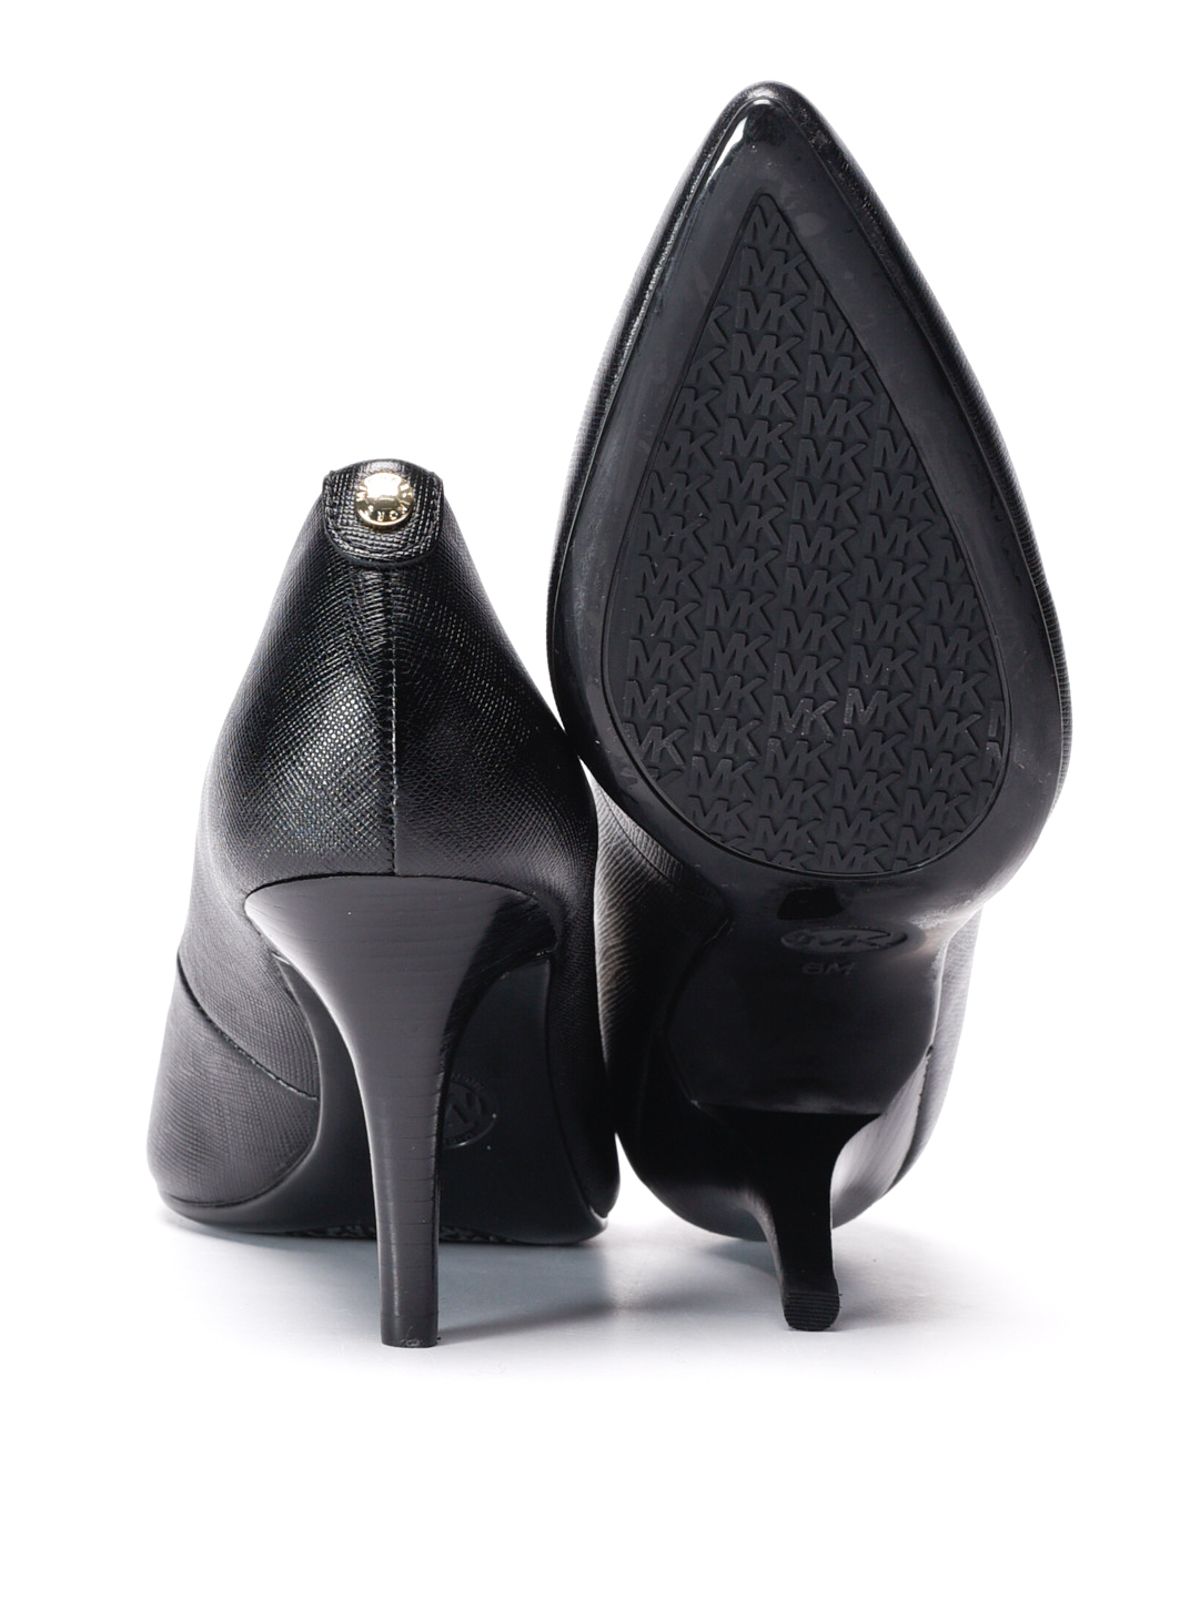 flex leather mid pumps by michael kors court shoes ikrix. Black Bedroom Furniture Sets. Home Design Ideas